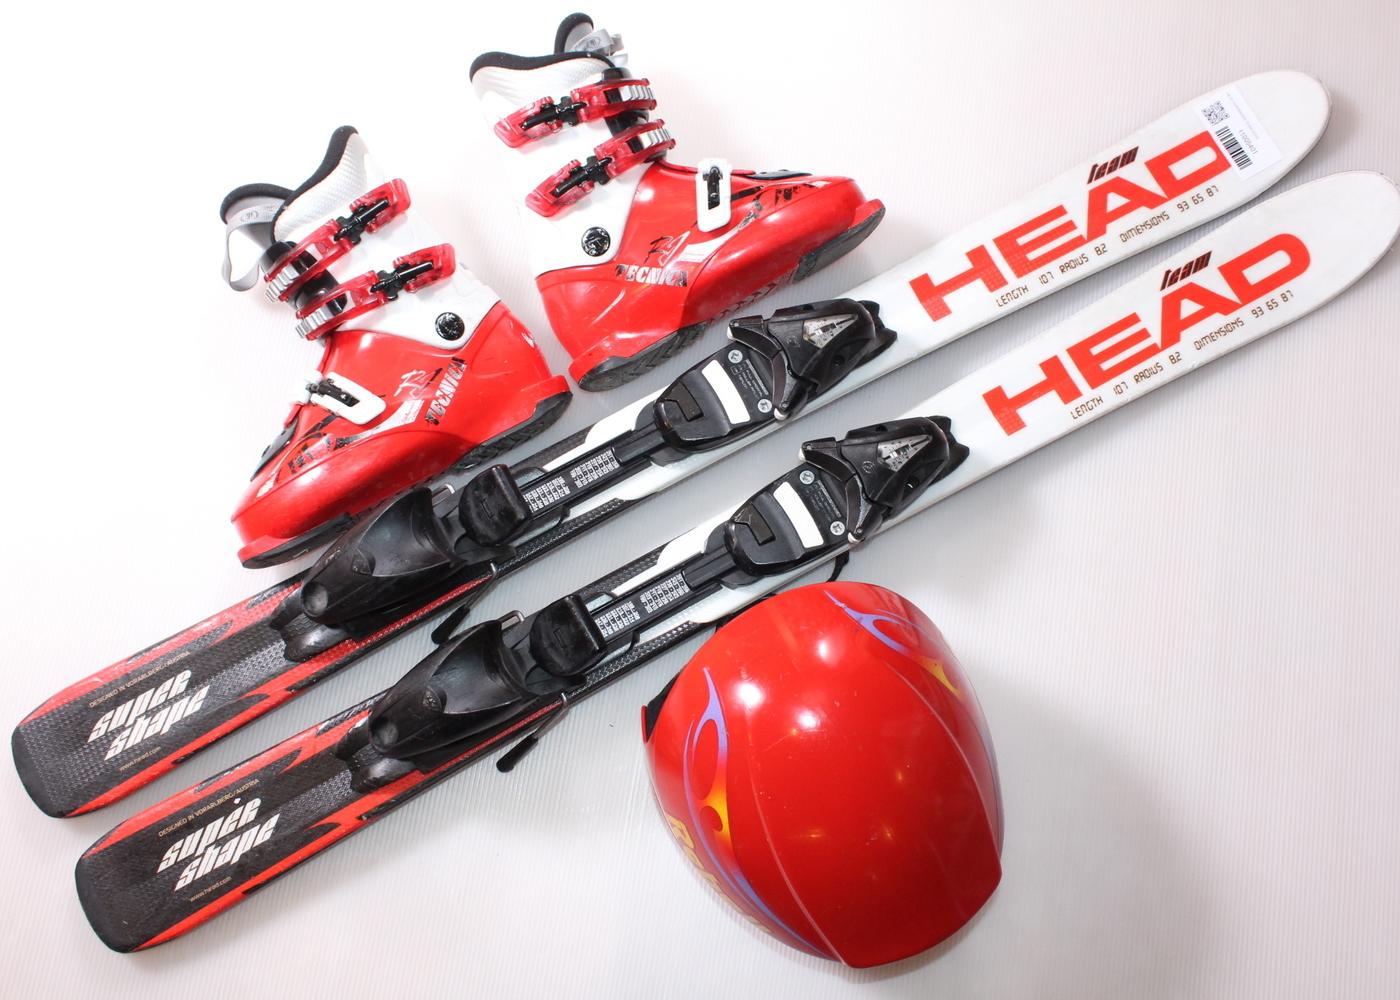 Dětské lyže HEAD SUPERSHAPE TEAM 107 cm + lyžáky  33EU + helma